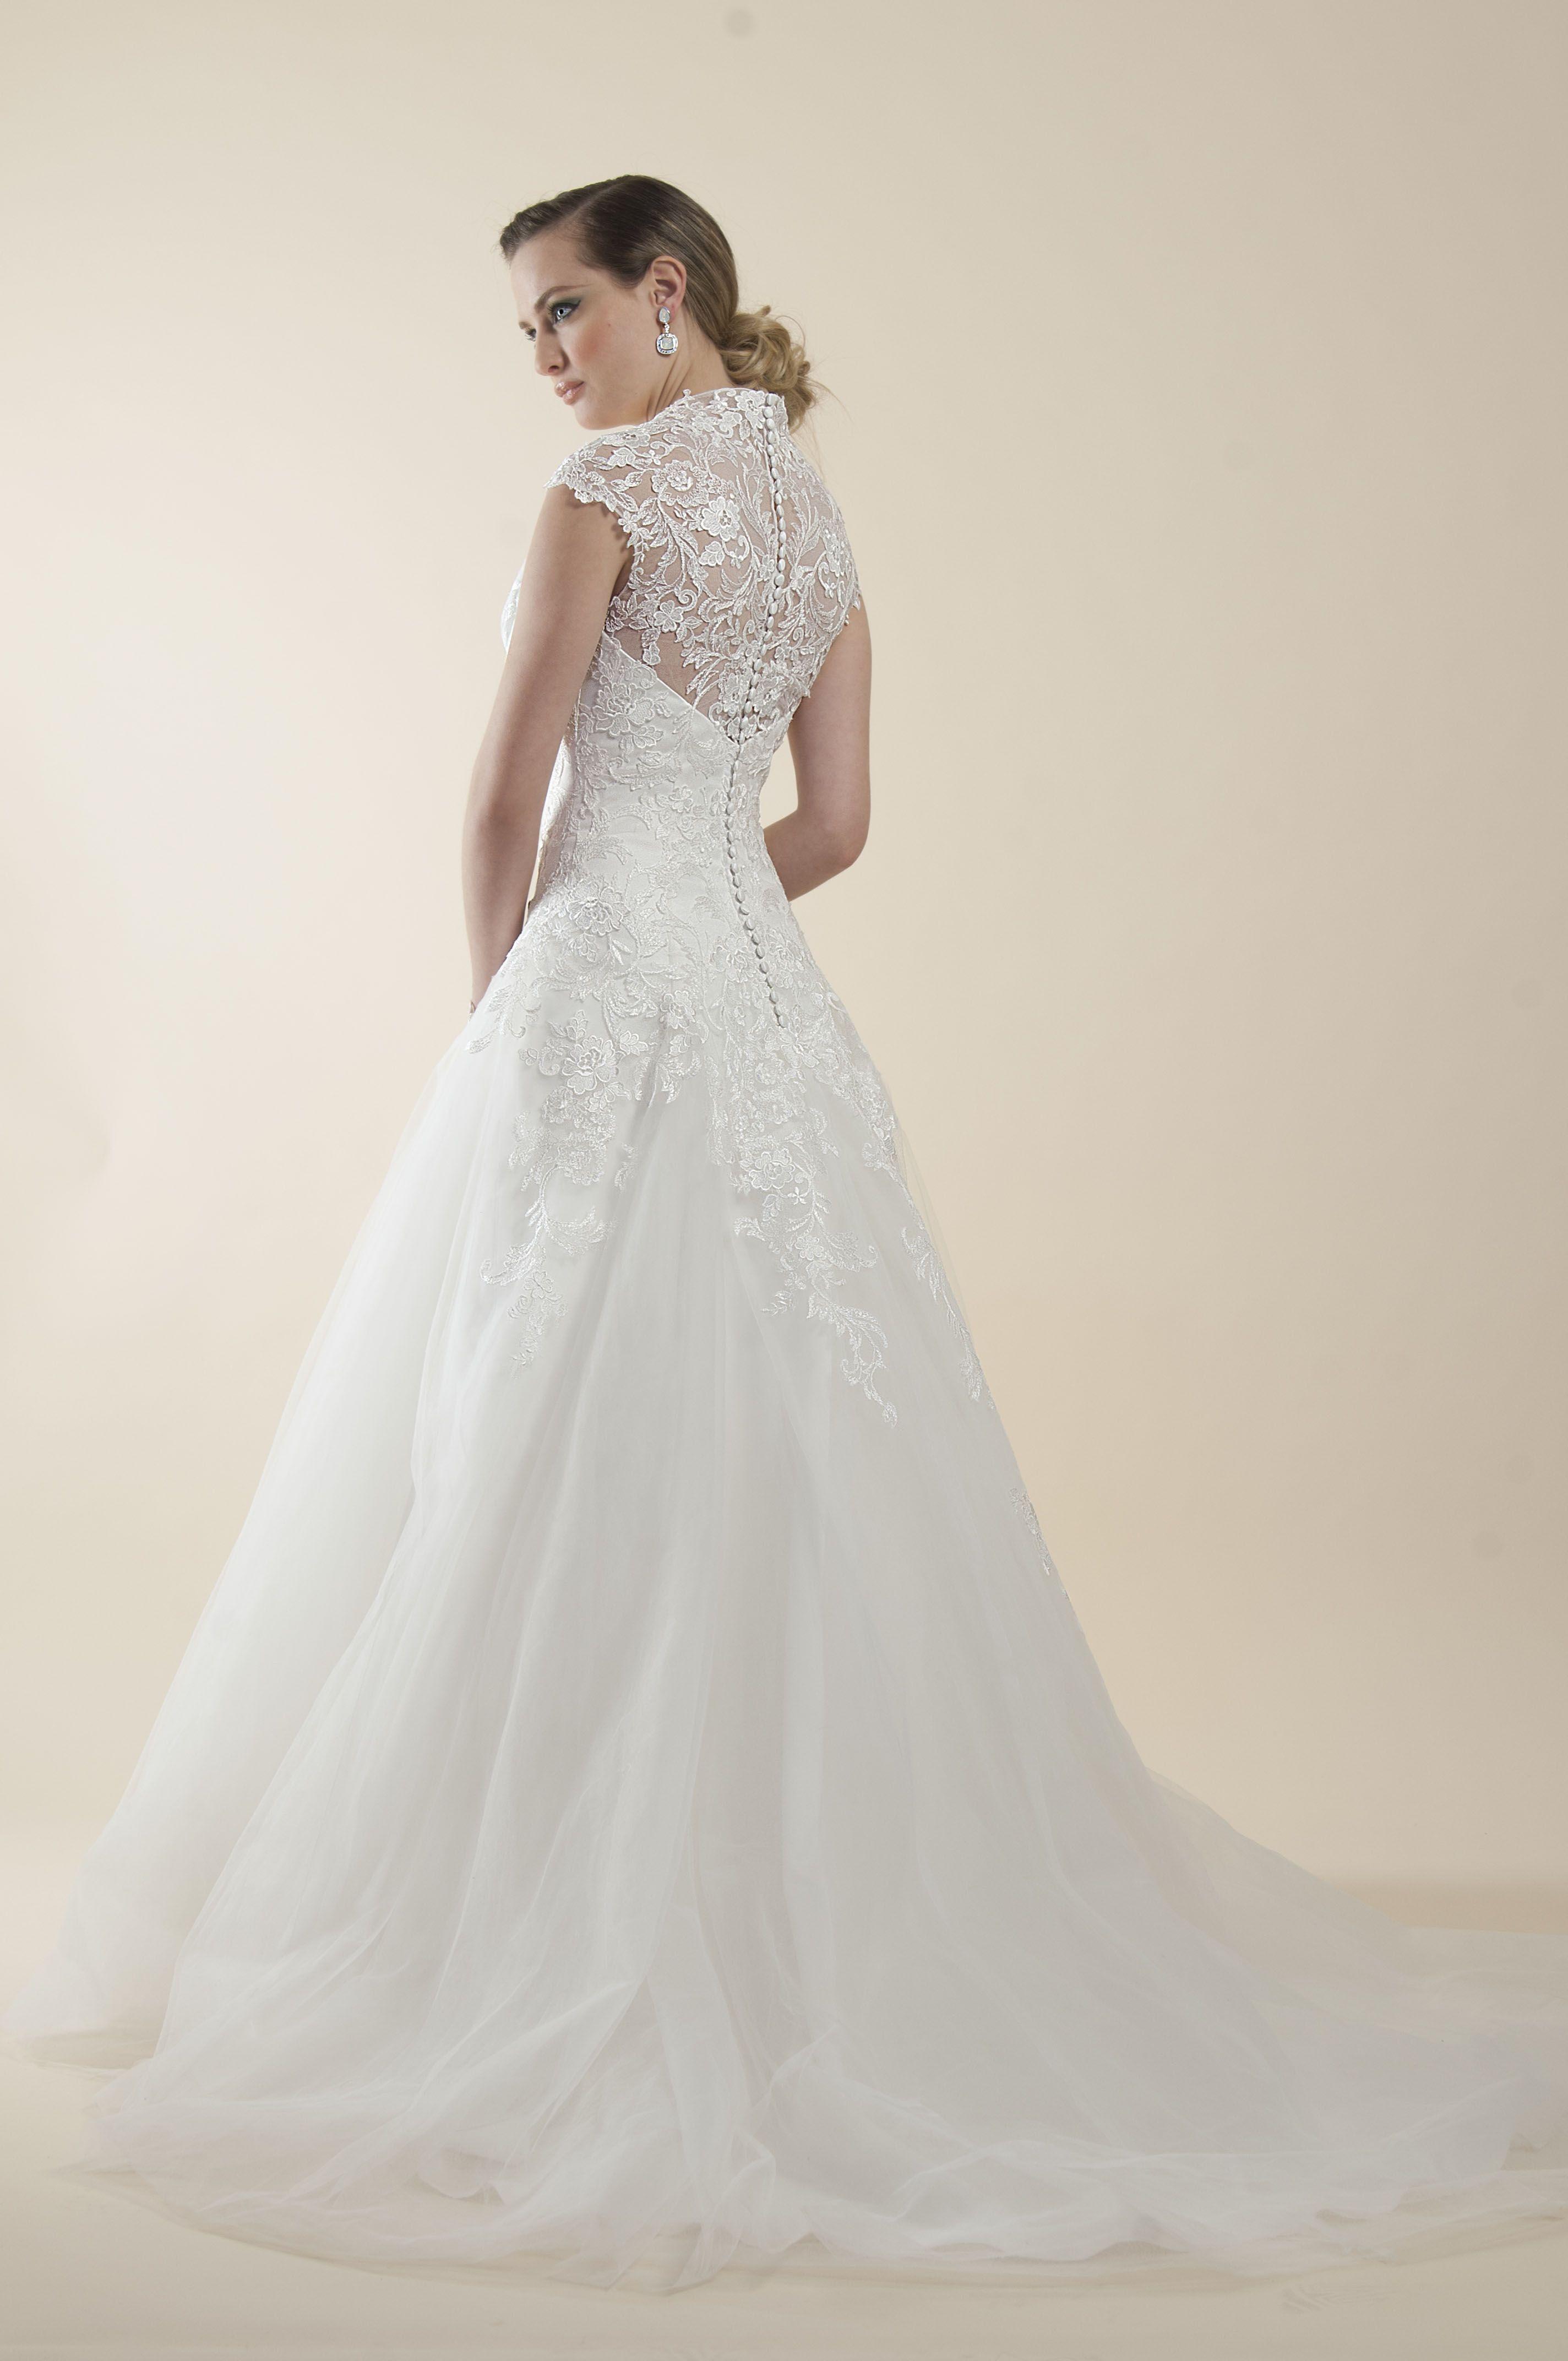 Alfred sung bridal 6929 love it wedding ideas pinterest alfred sung bridal 6929 love it ombrellifo Choice Image